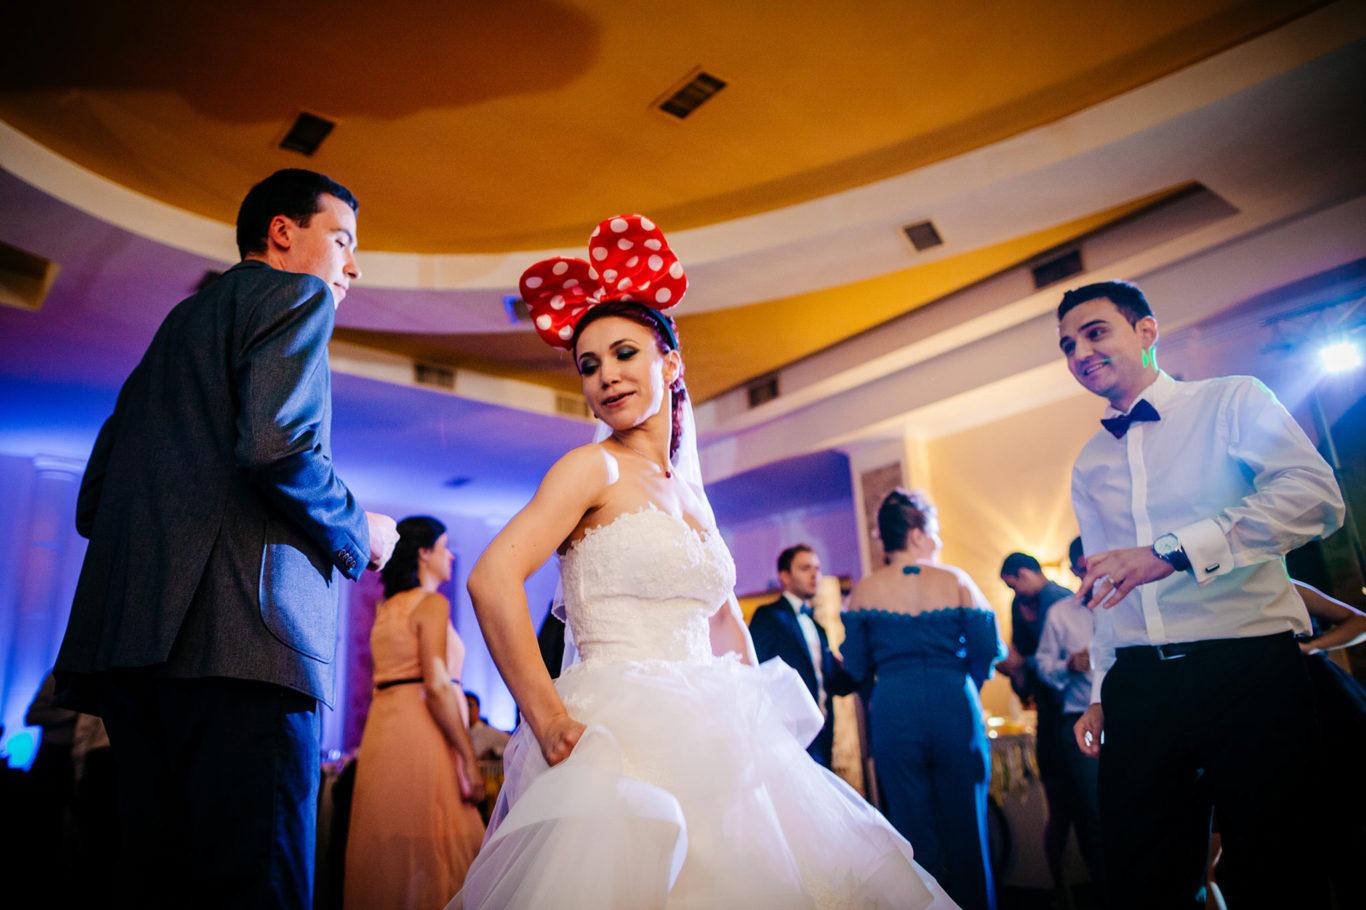 0567-fotografie-nunta-bucuresti-cristina-nicusor-fotograf-ciprian-dumitrescu-dc1_0093-2